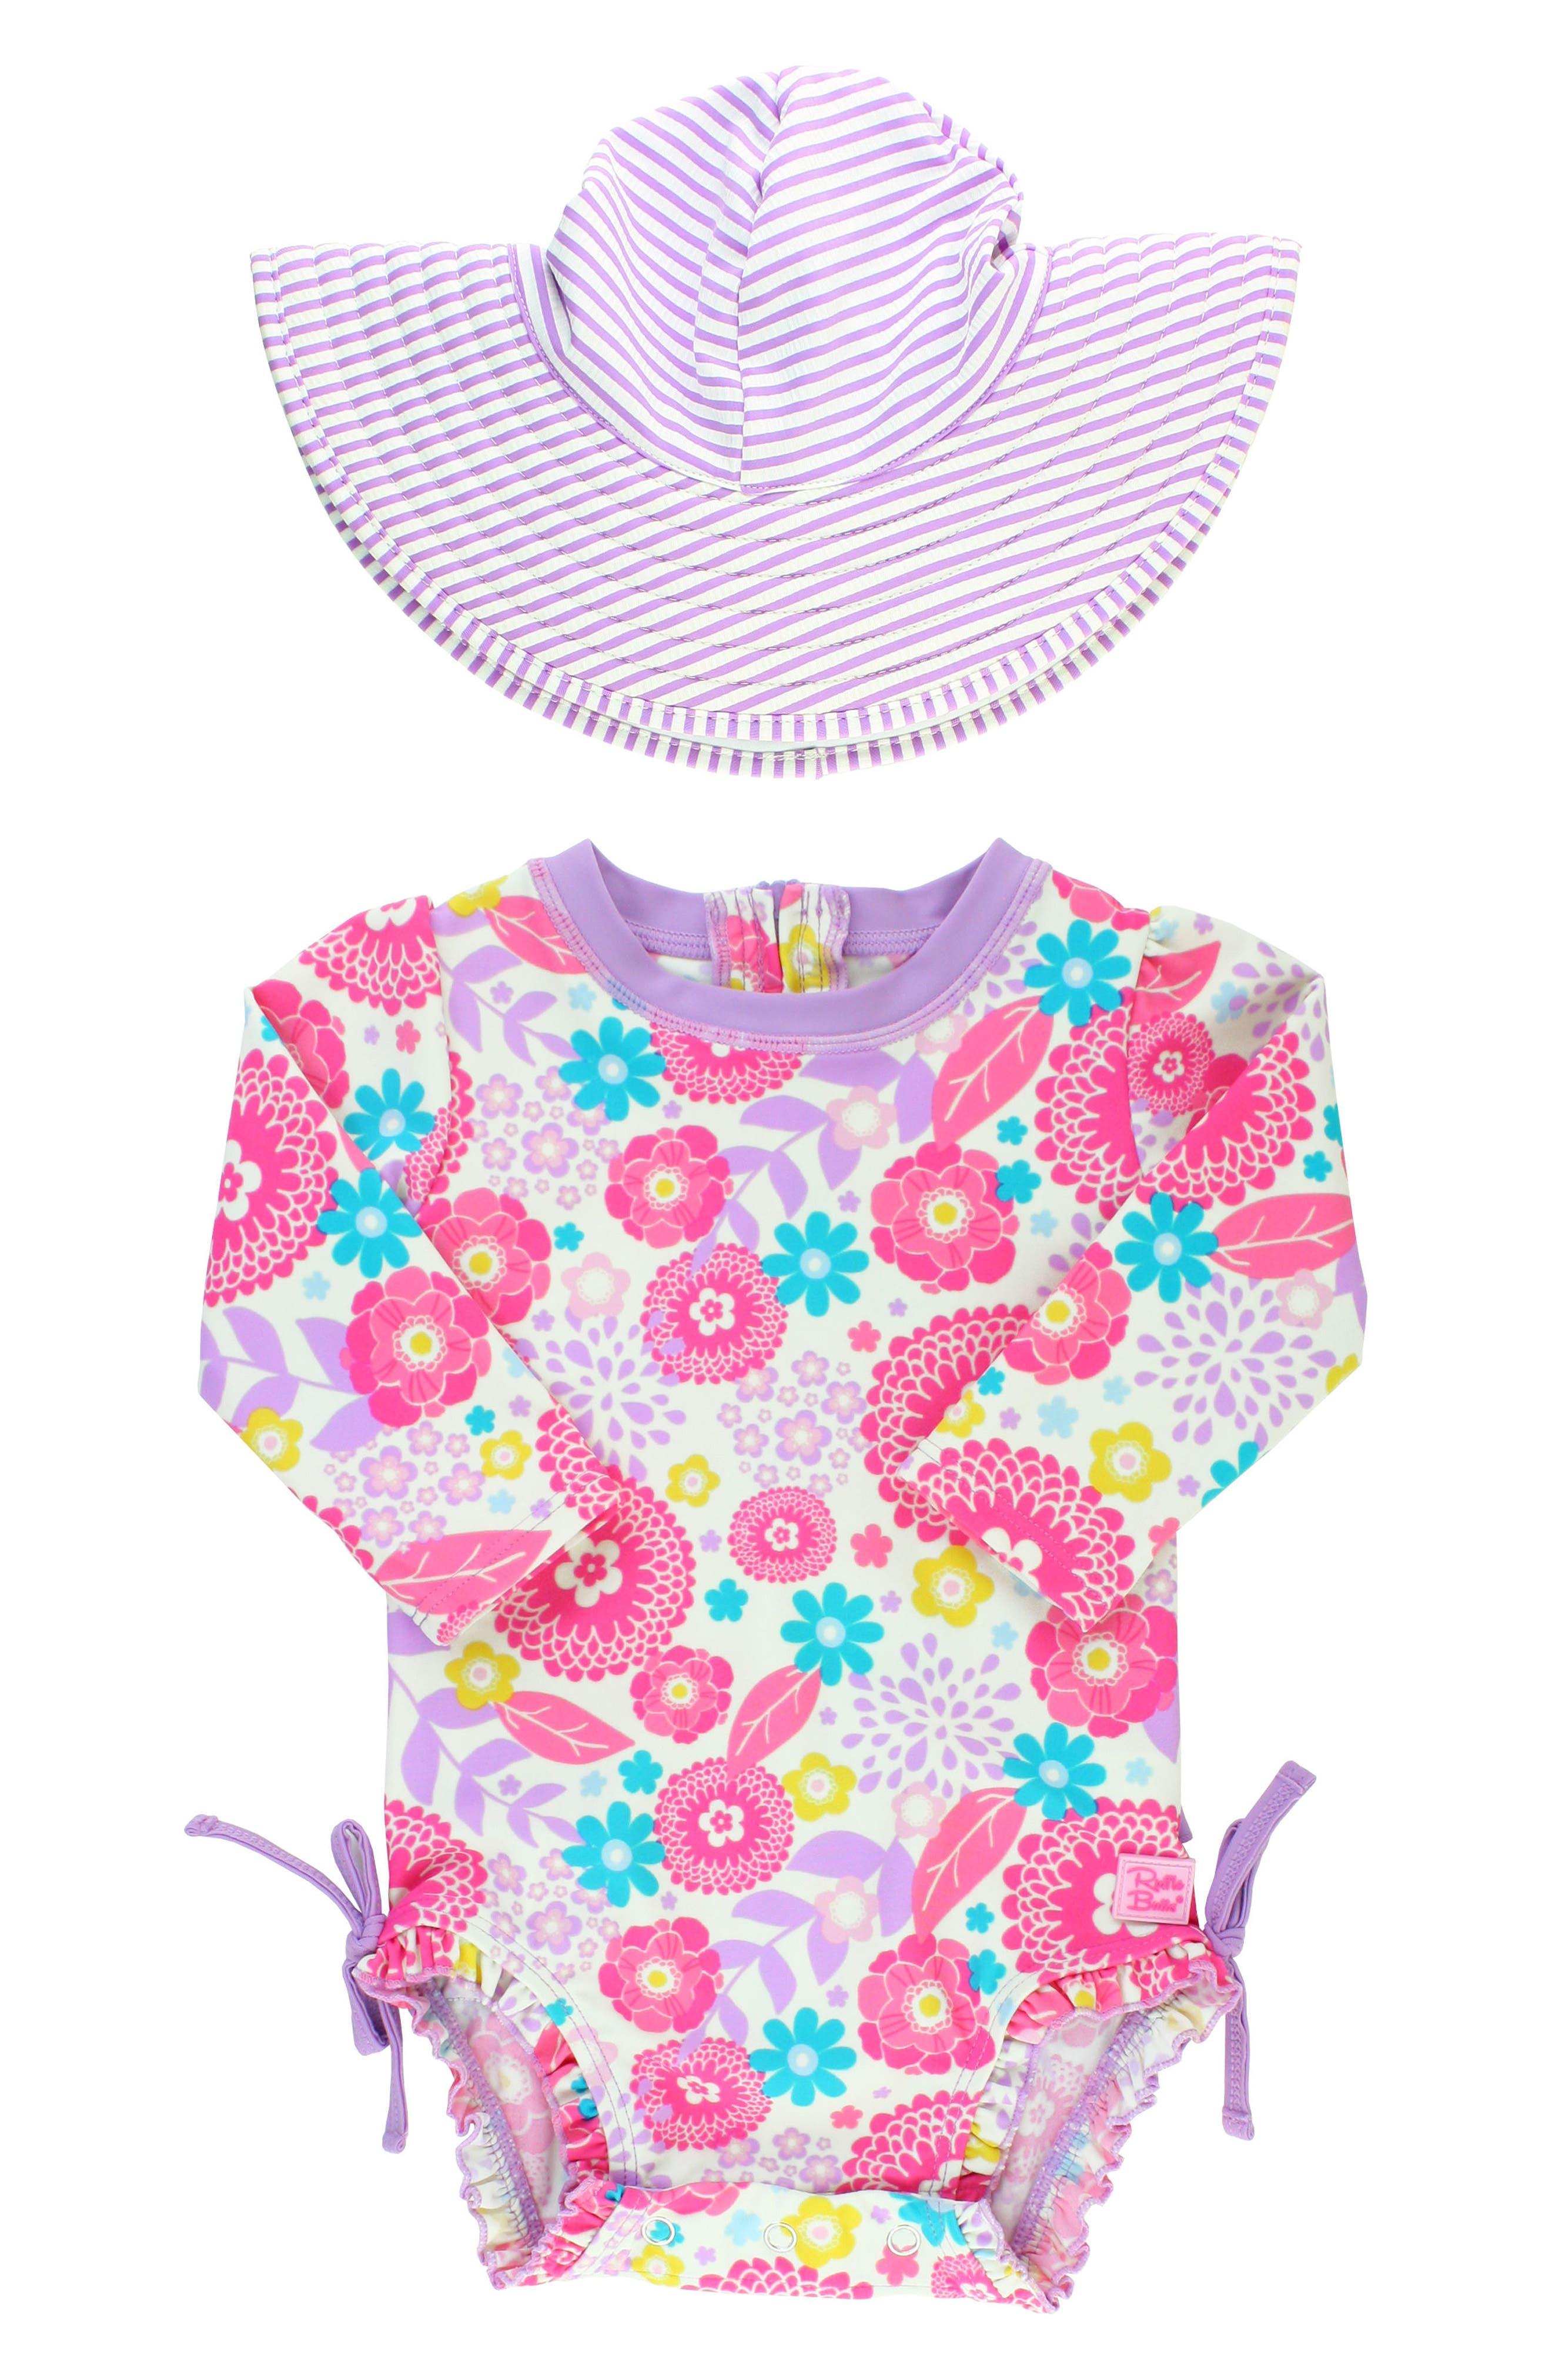 Alternate Image 1 Selected - RuffleButts Blooming Buttercups One-Piece Rashguard Swimsuit & Hat Set (Baby Girls)